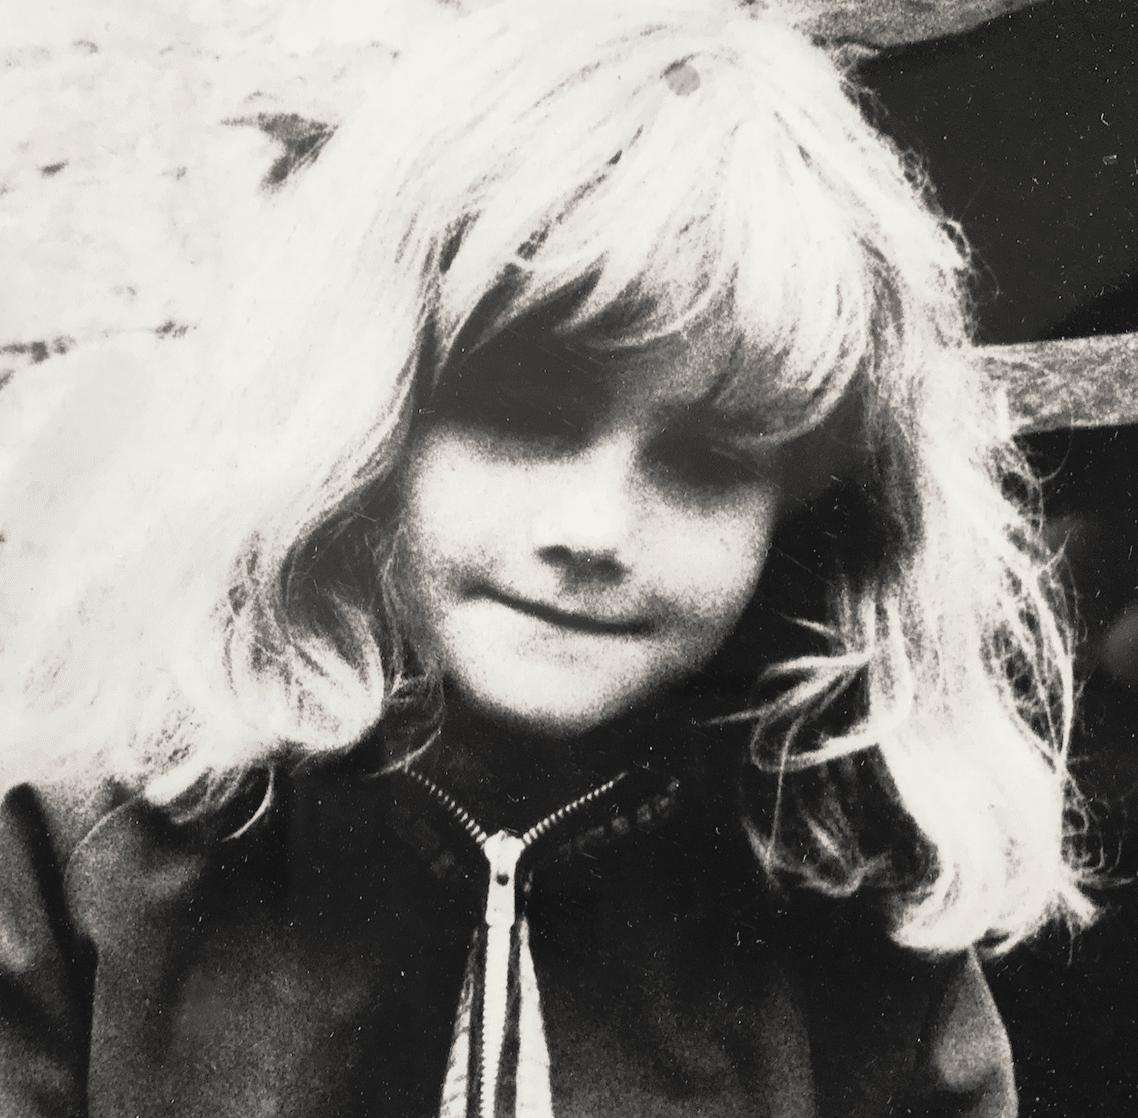 Oona Alexander as a young girl